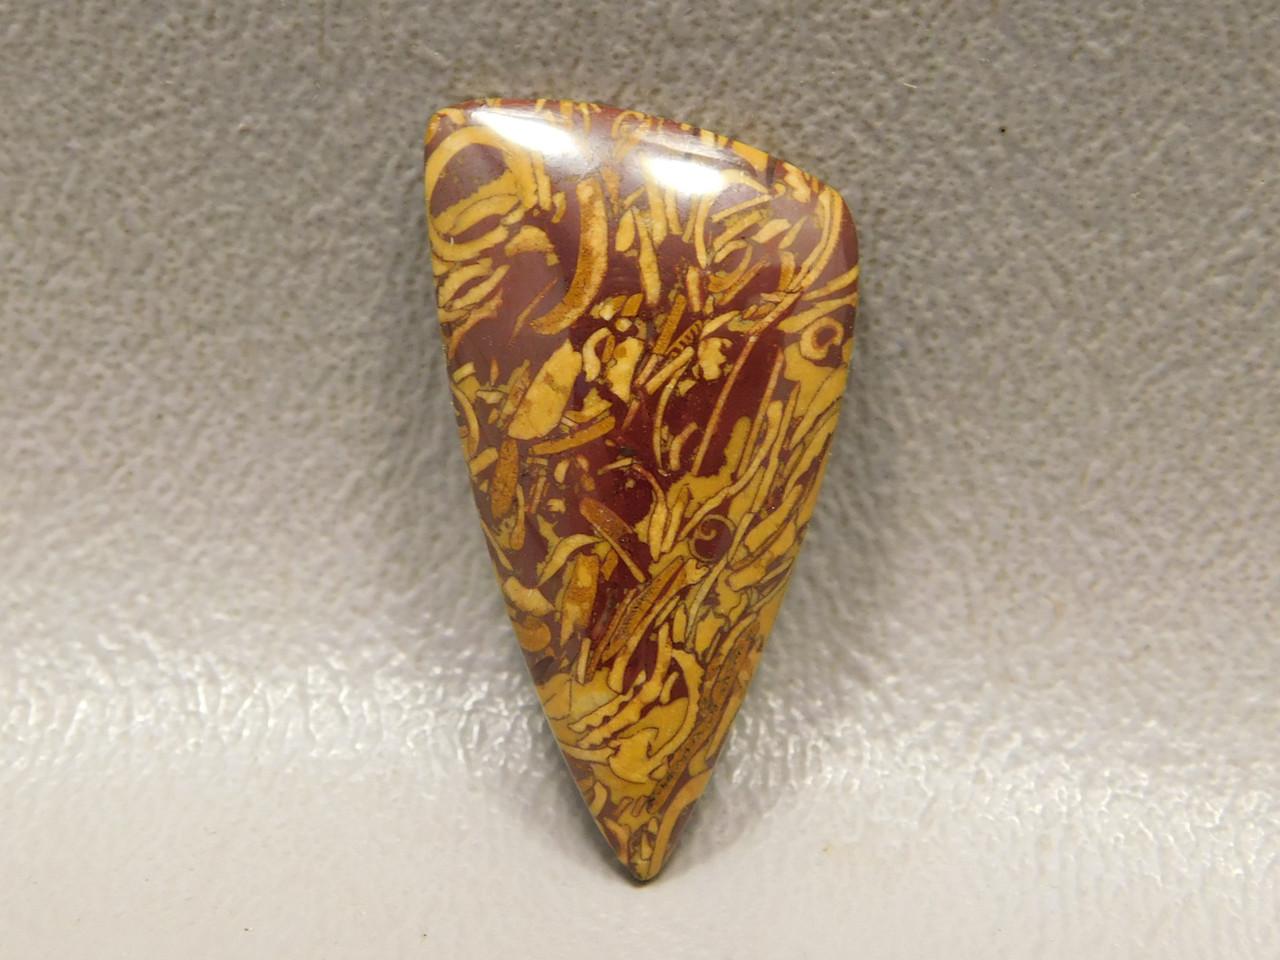 Triangle Cabochon Coquina Jasper Cobra Stone for Jewelry Making #24